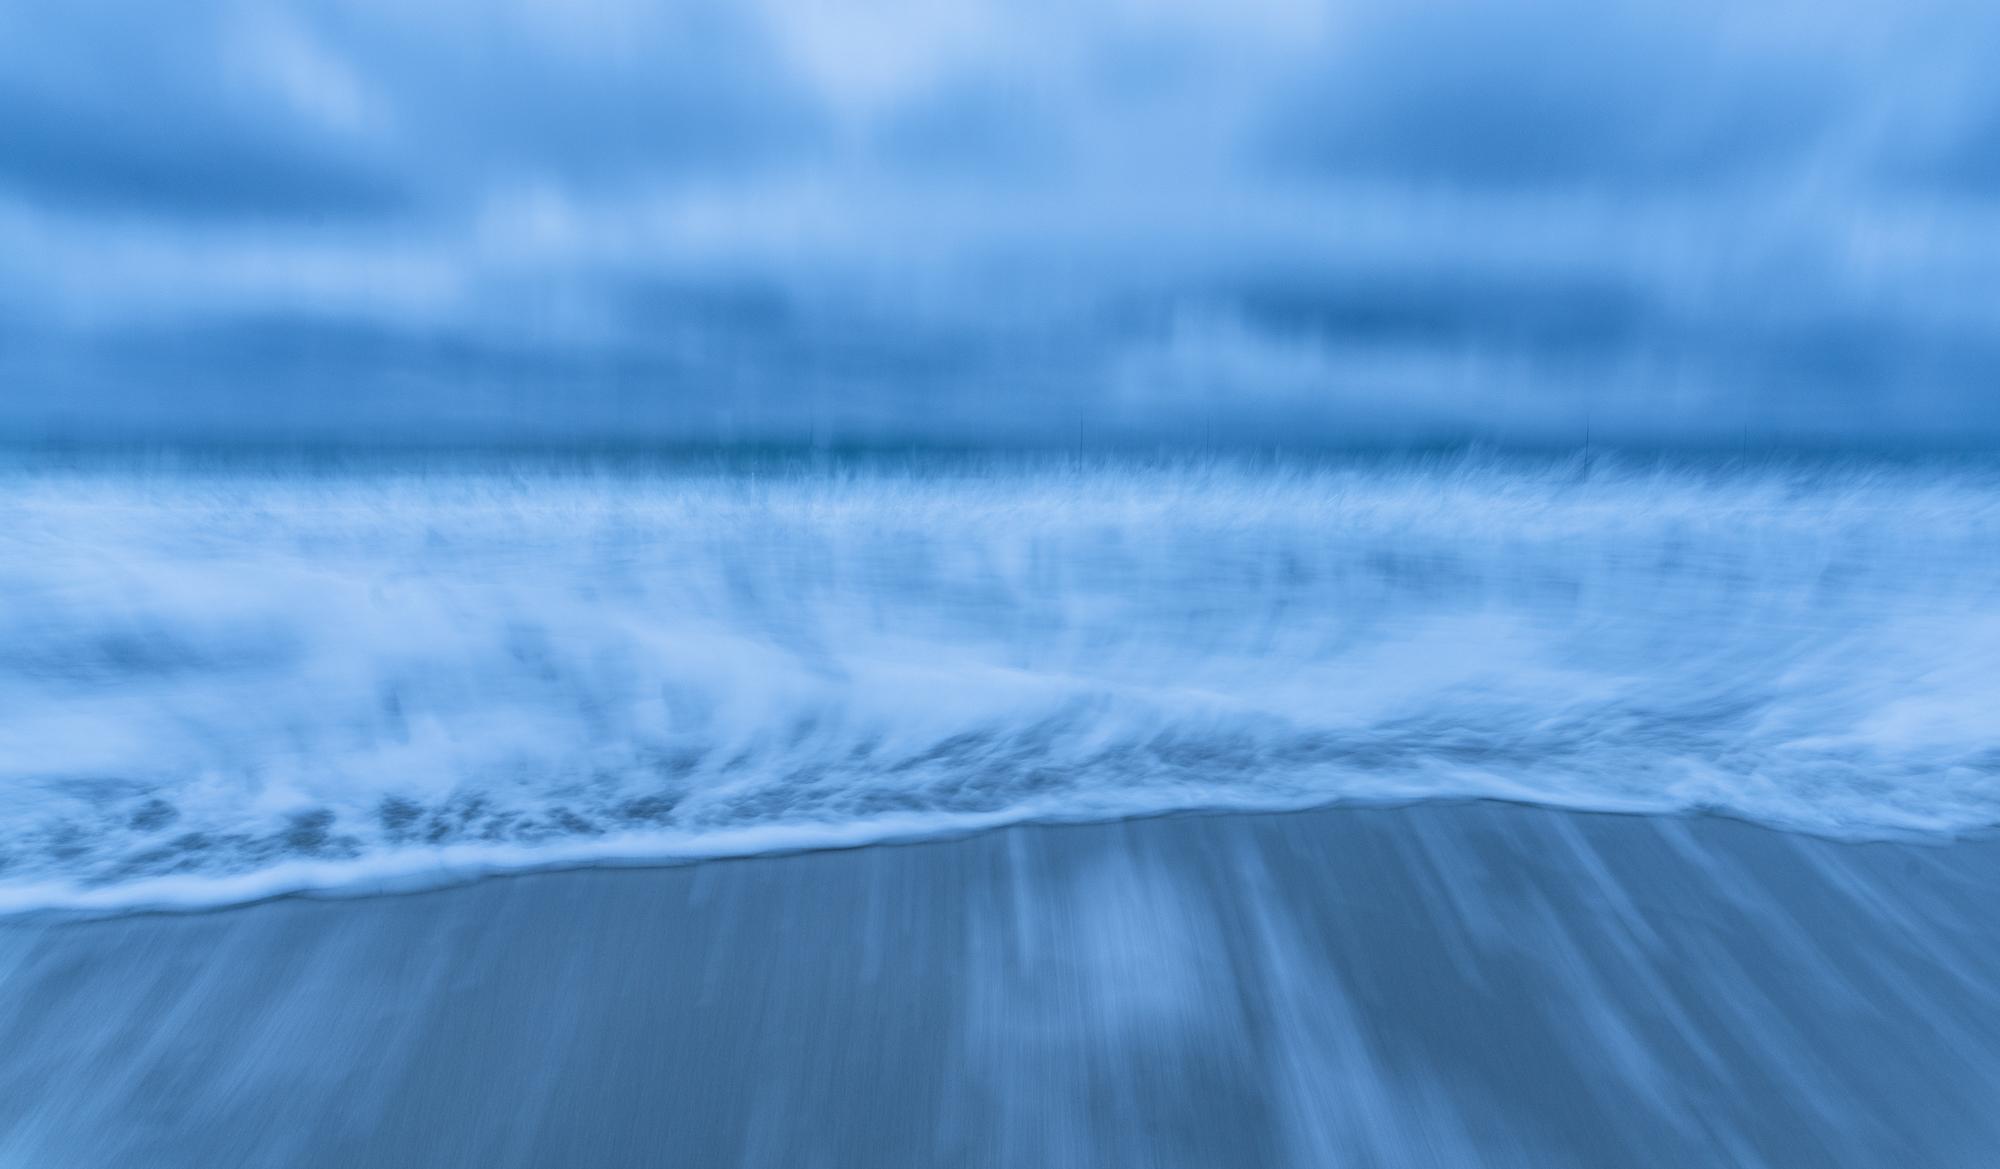 Waves at Bleik-DSC_0842.jpg